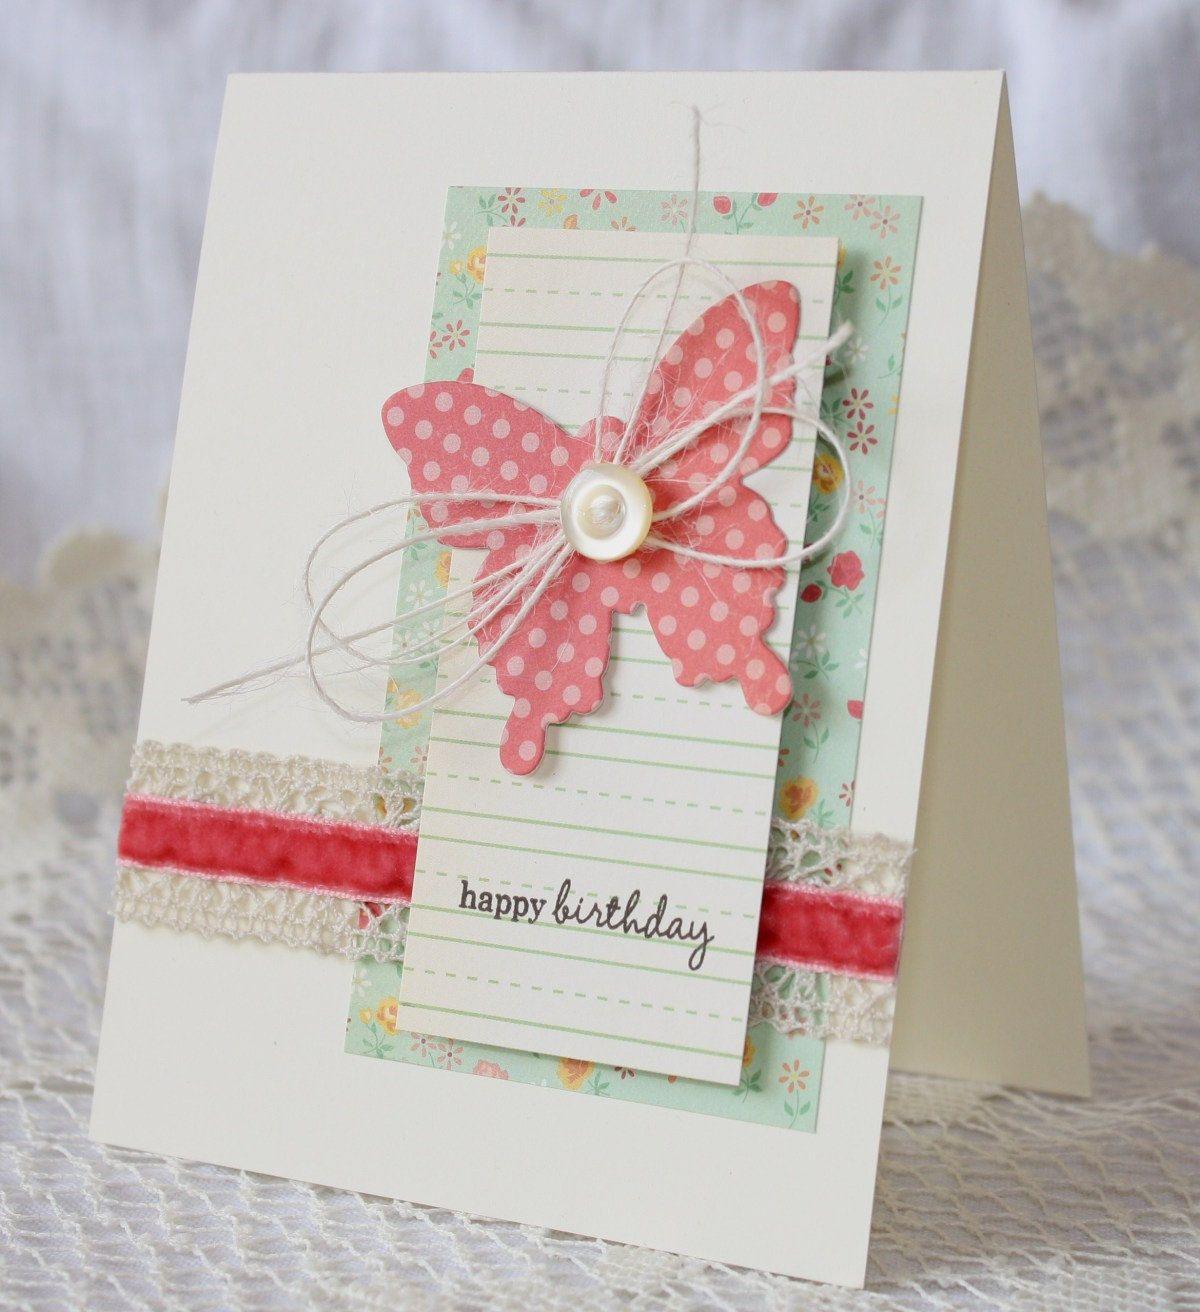 Handmade Happy Birthday Greeting Card. $3.50, Via Etsy